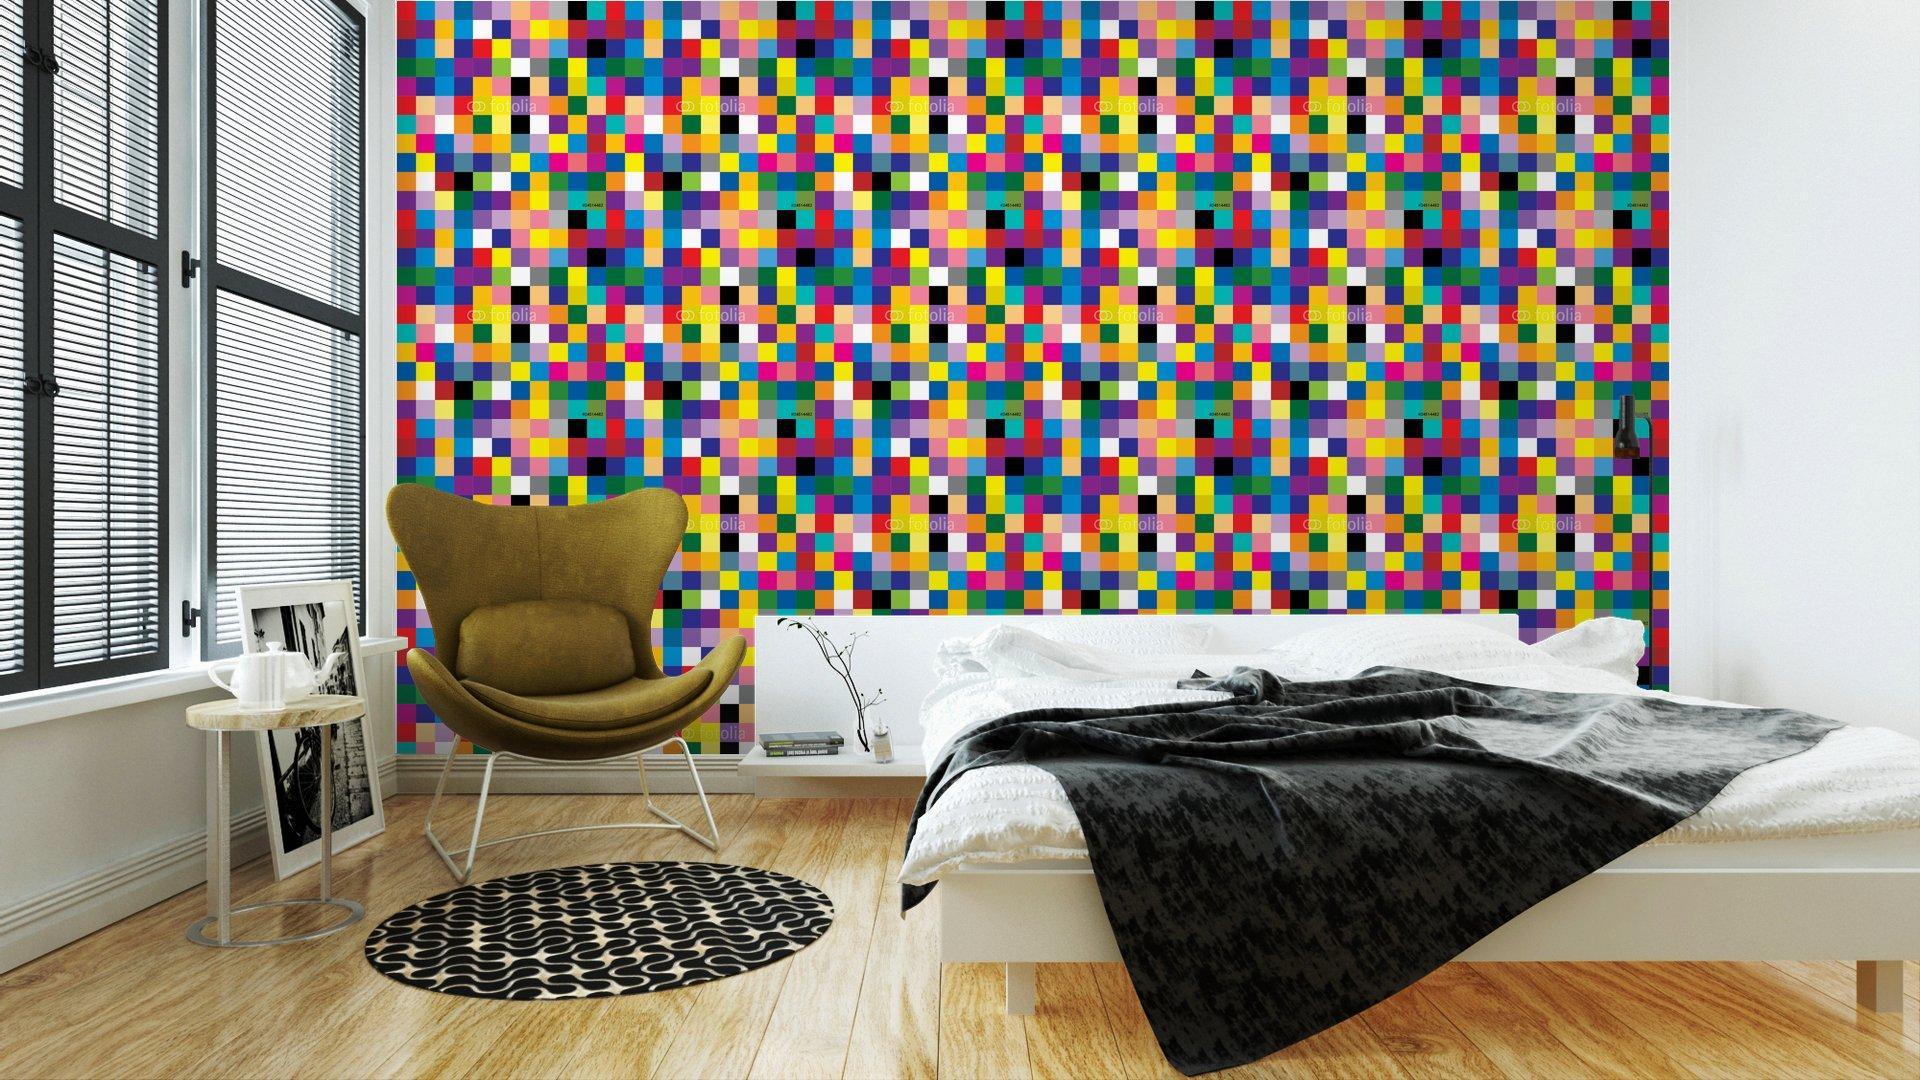 Fotomurales mexico papeles pintados abstracto cuadrado 4 - PapelTapizAbstracto Cuadros de Colores 01